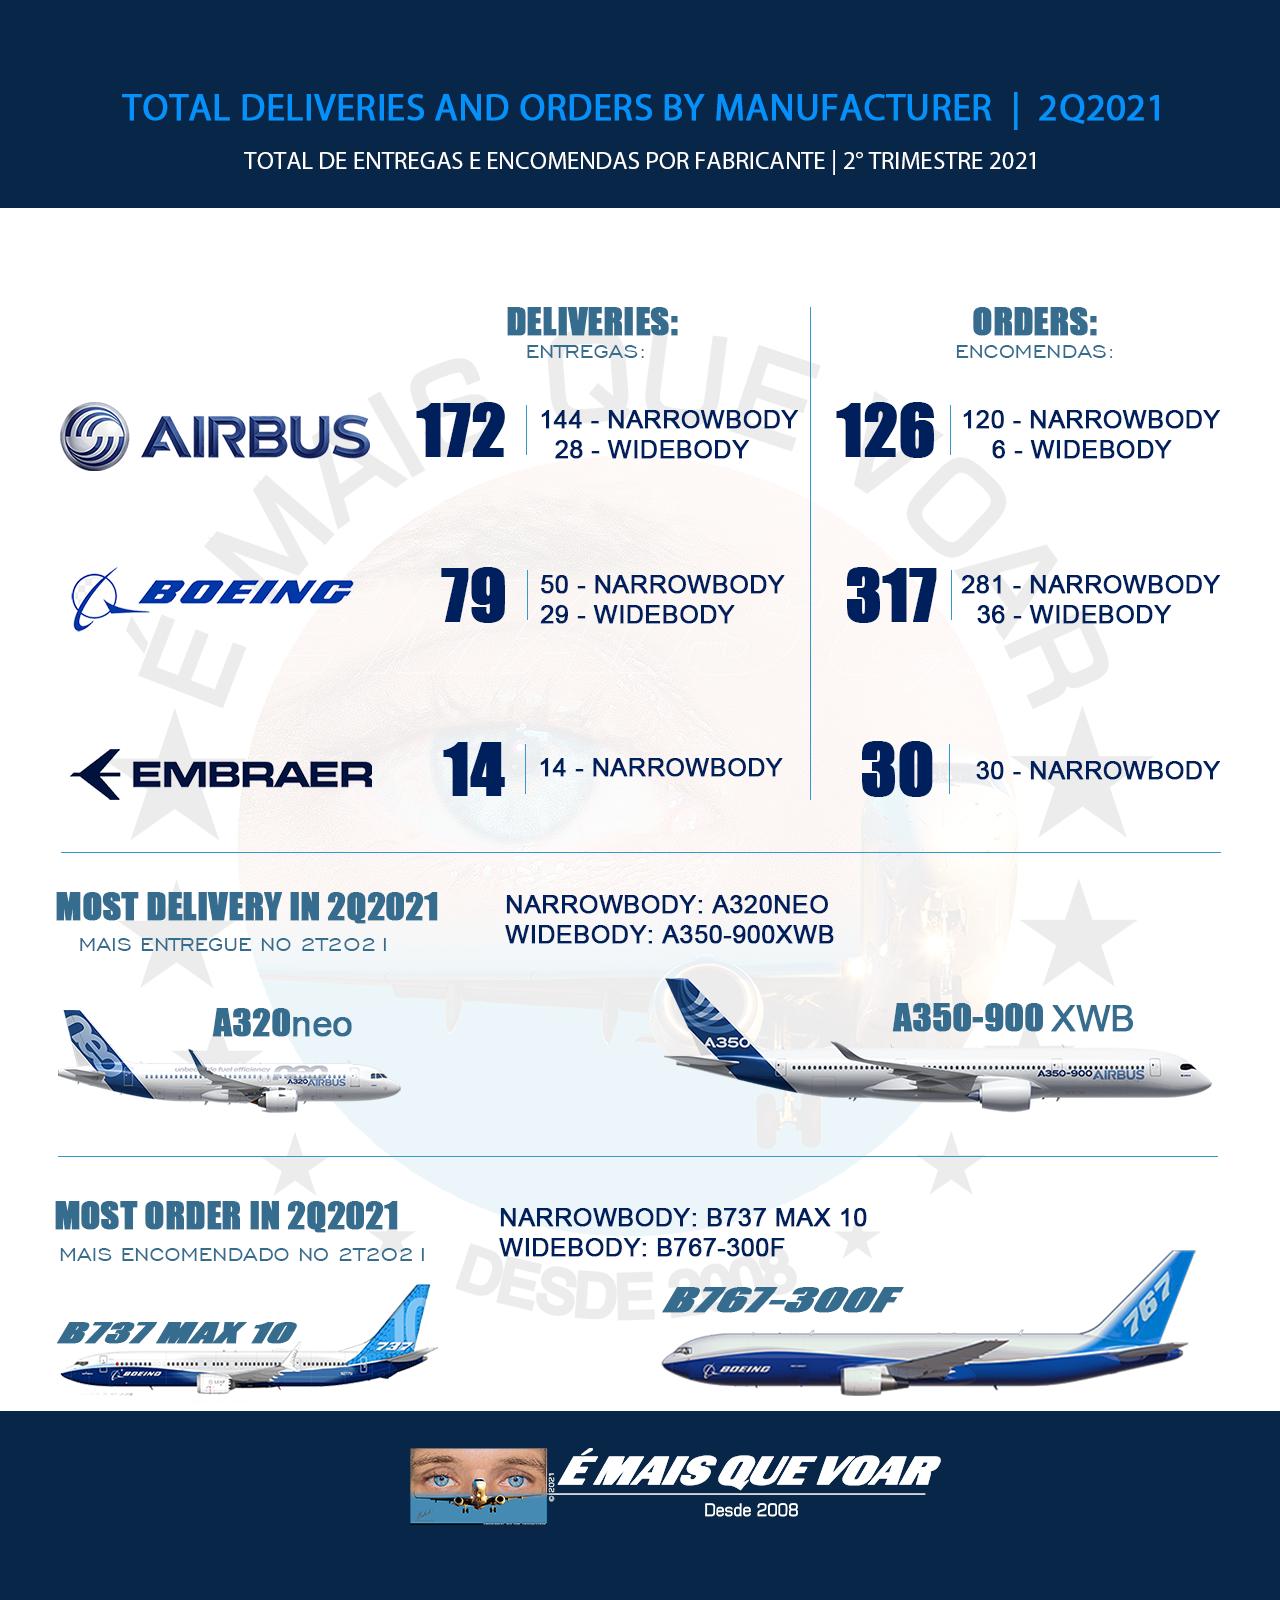 Airbus, Boeing e Embraer - entregas e encomendas  de aeronaves no Segundo Trimestre de 2021 (2T2021)